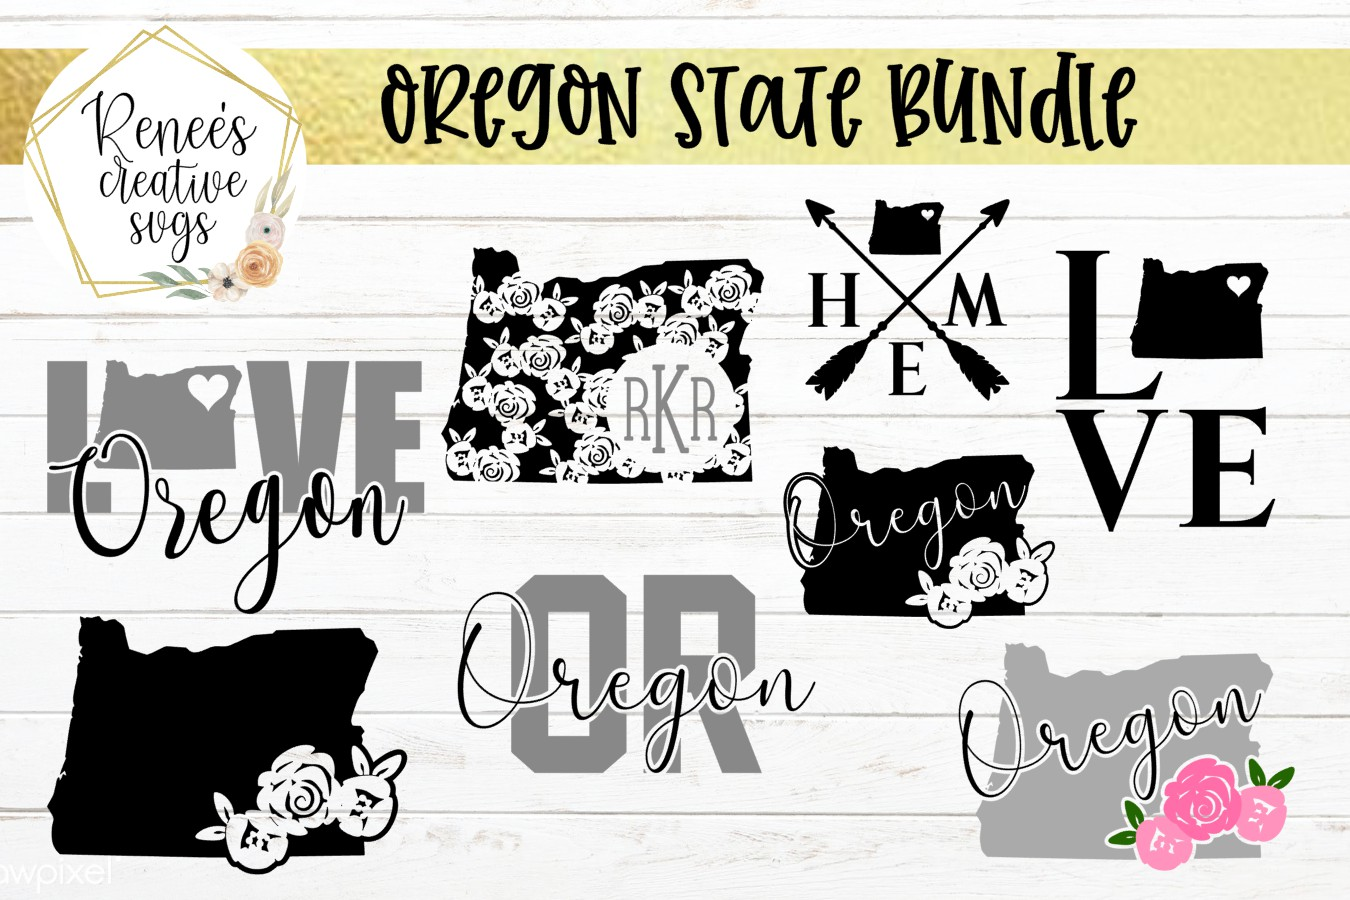 Oregon State Bundle  State Bundle SVG   SVG Cutting file example image 1